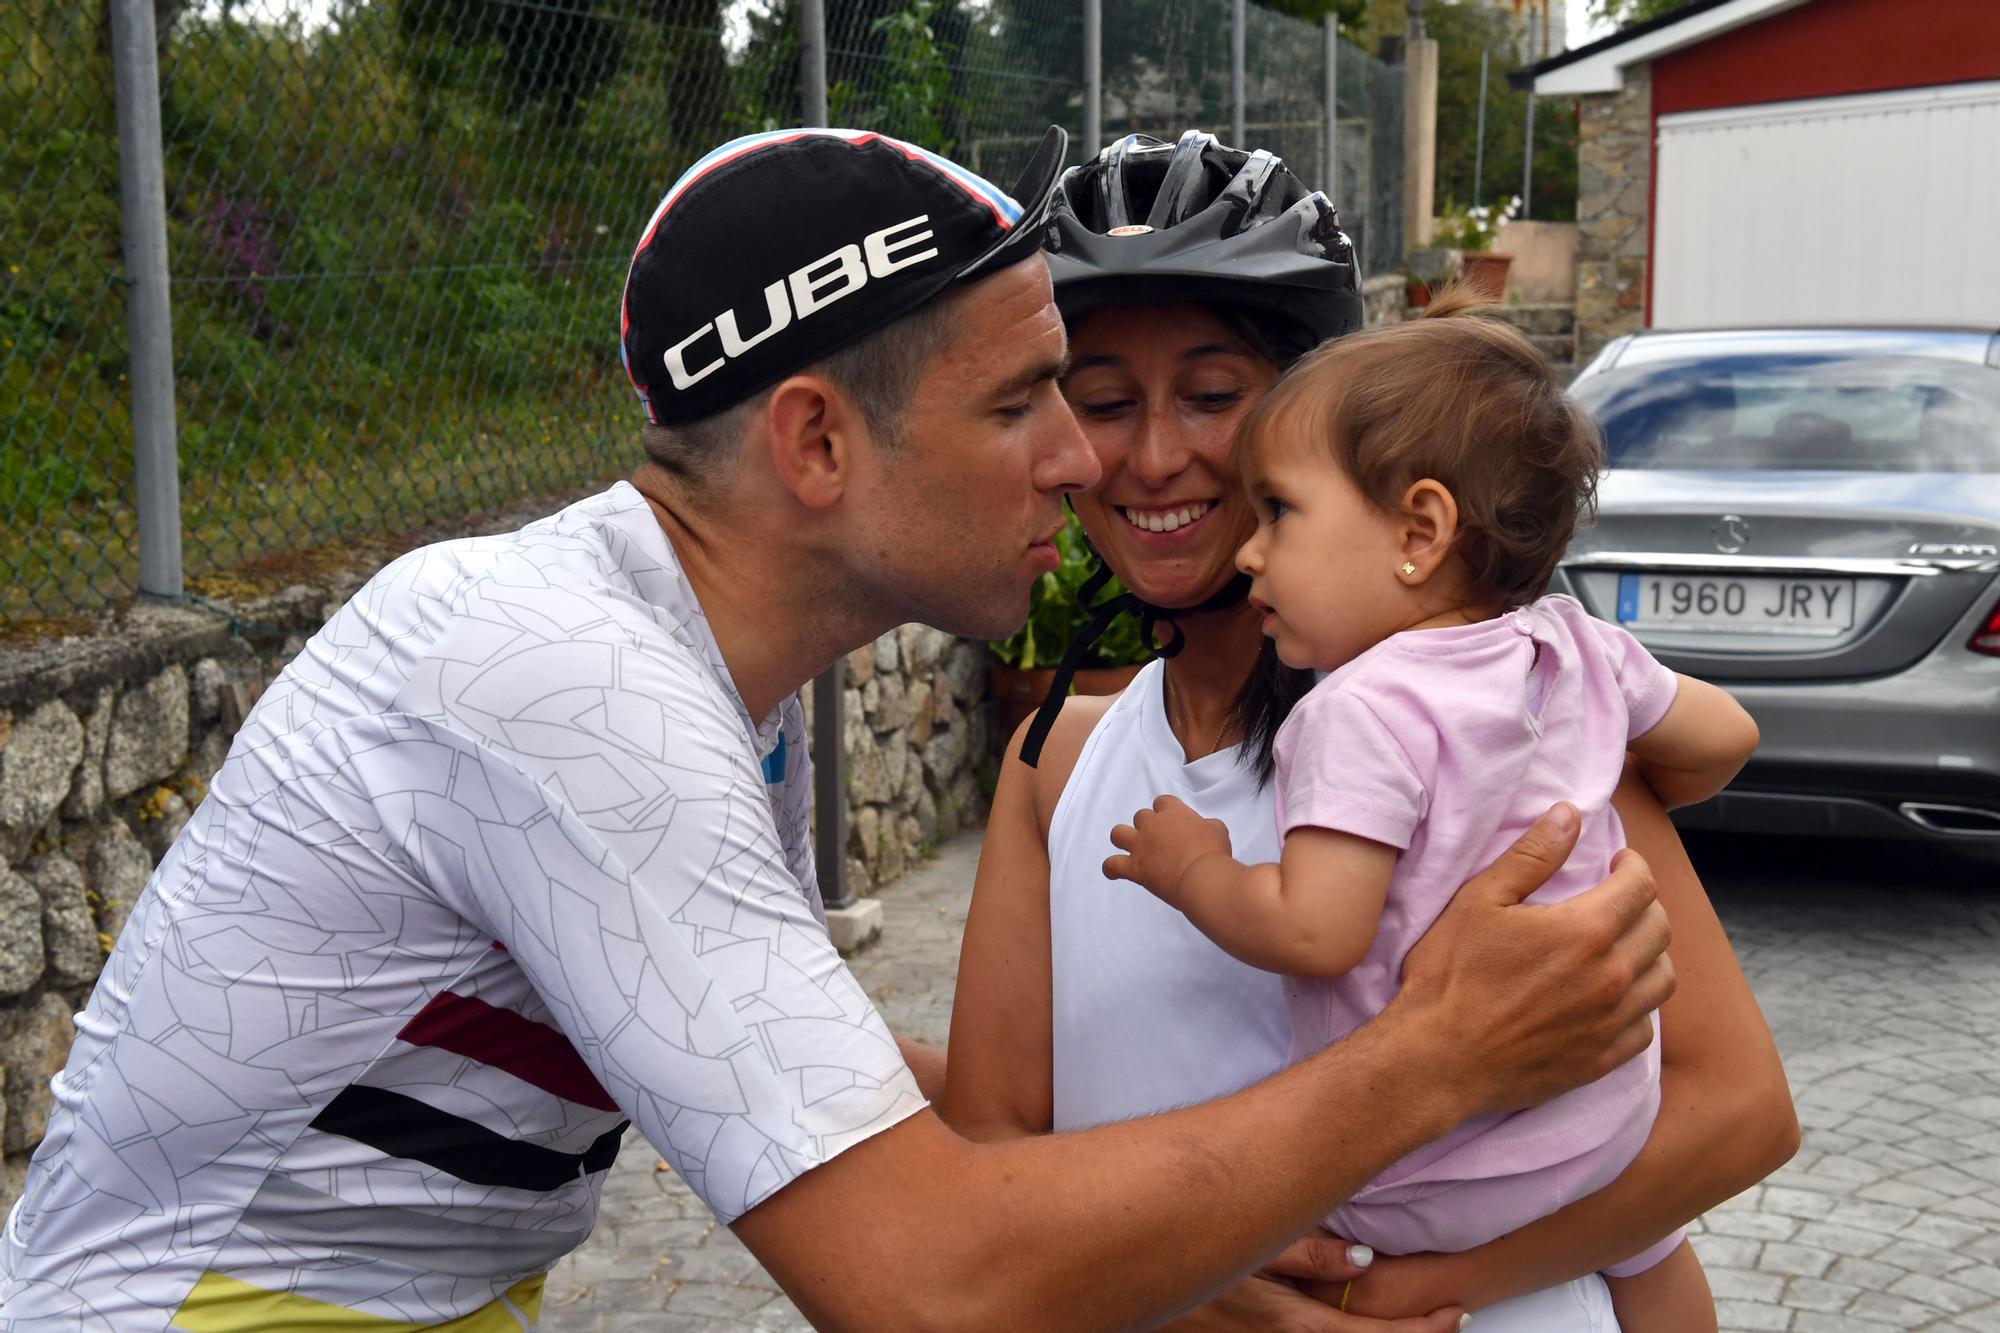 26 días y 2.200 kilómetros en bicicleta después, Ángel llegó a casa